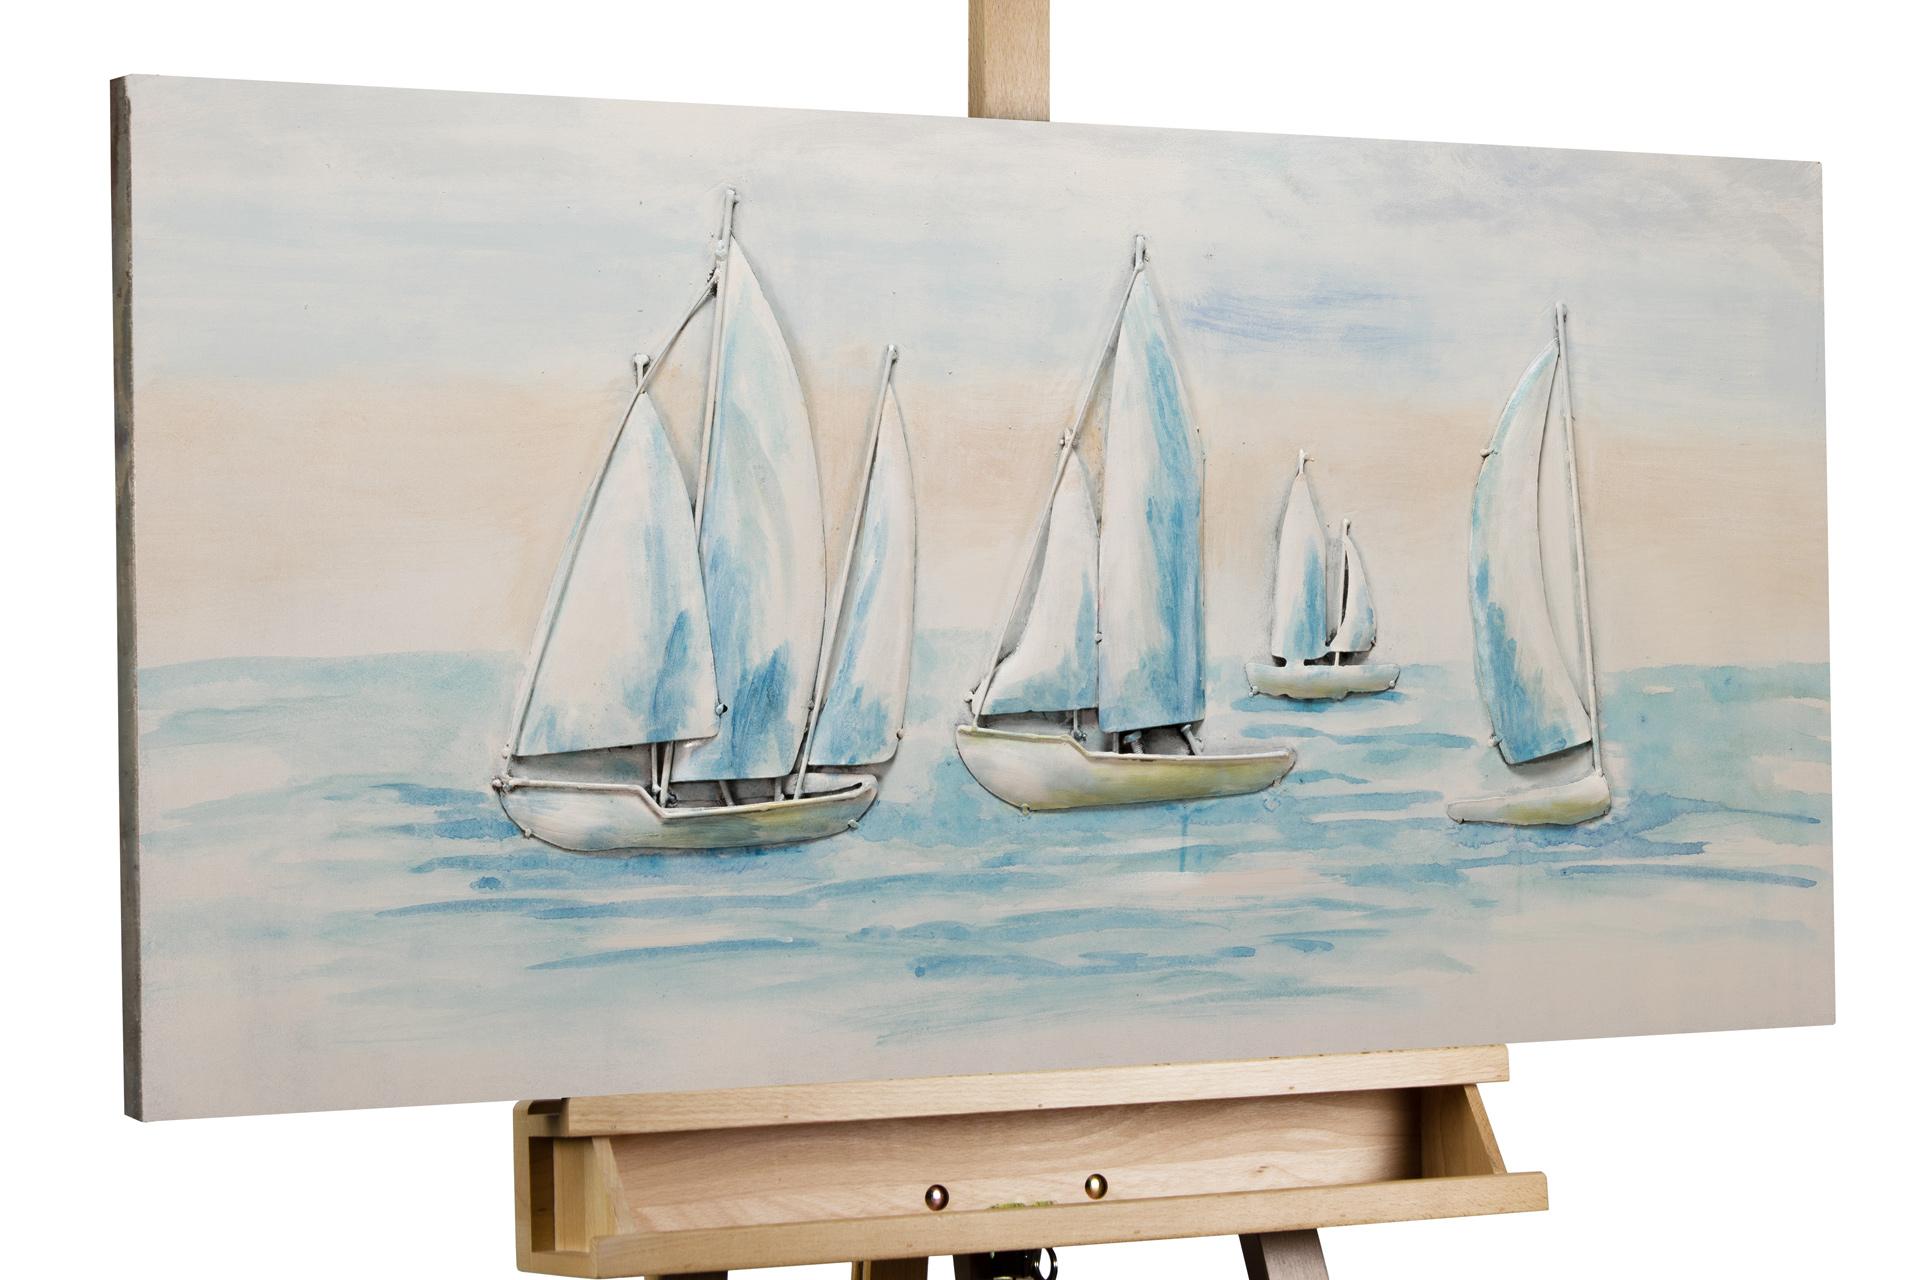 Wanddekoration Garten Schön Metal Painting Freedom Of the Seas 39x20x1 Inches